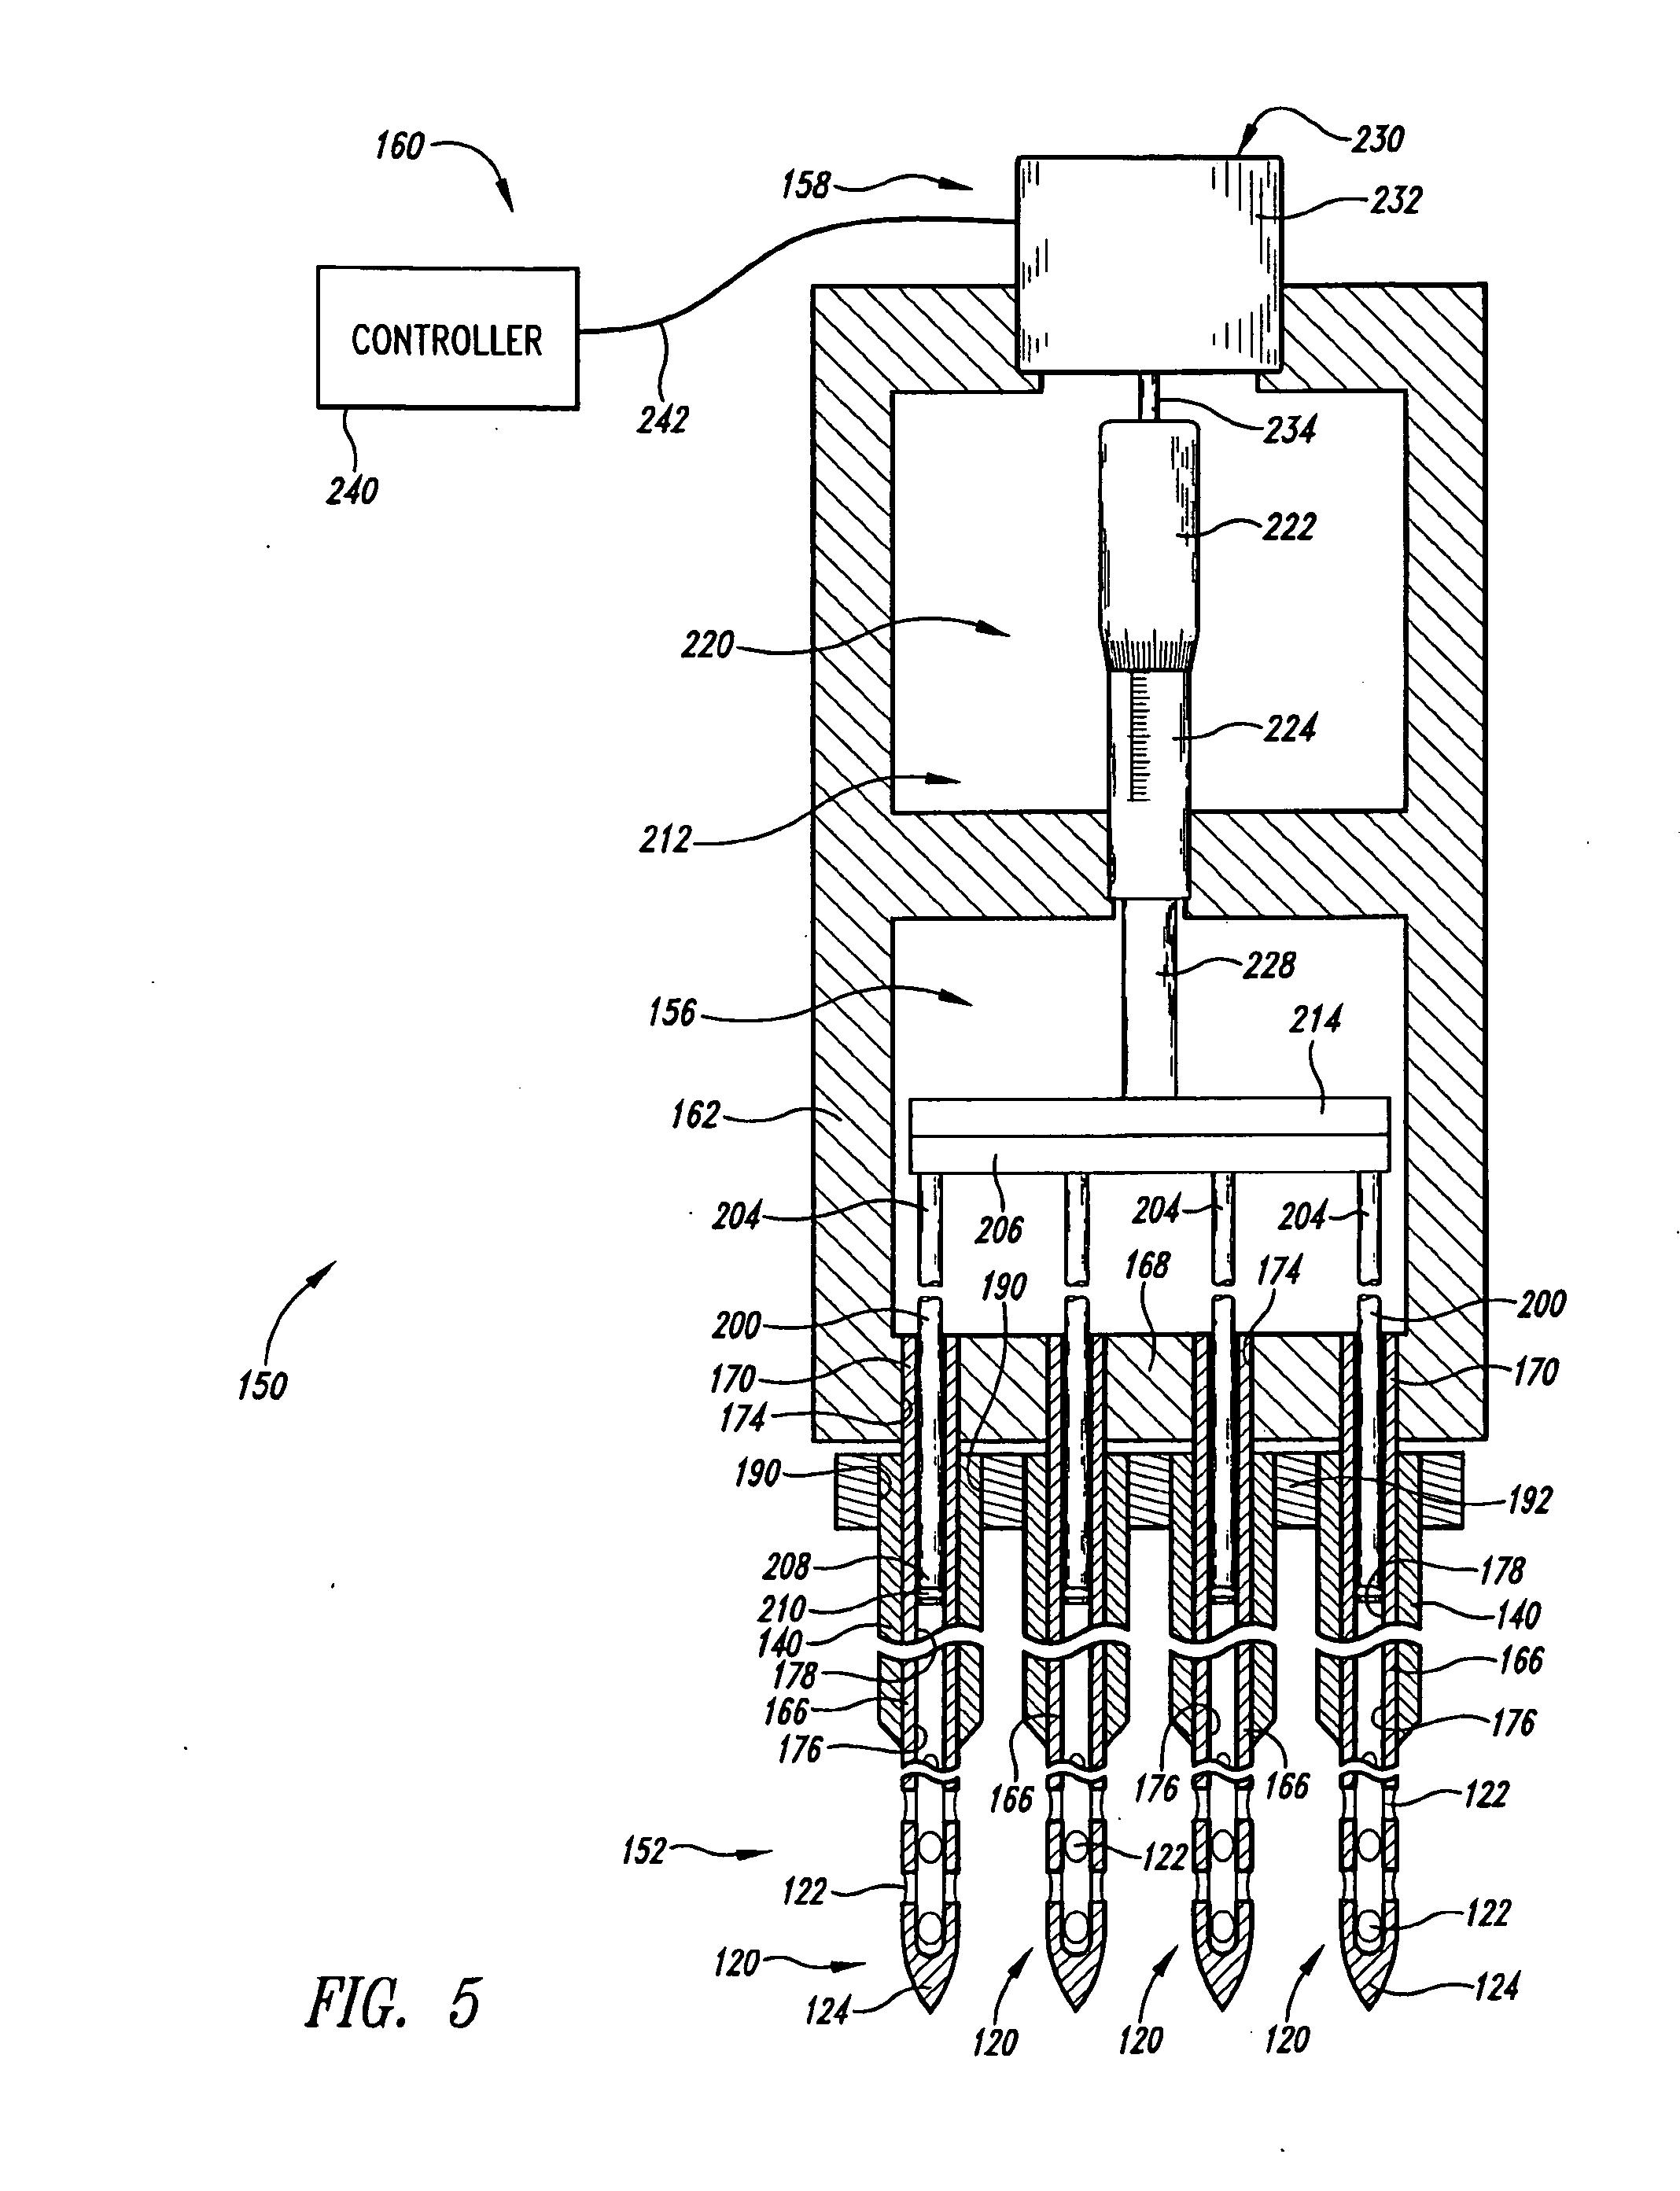 Luxury Franklin Electric Control Box Wiring Diagram Crest Wiring